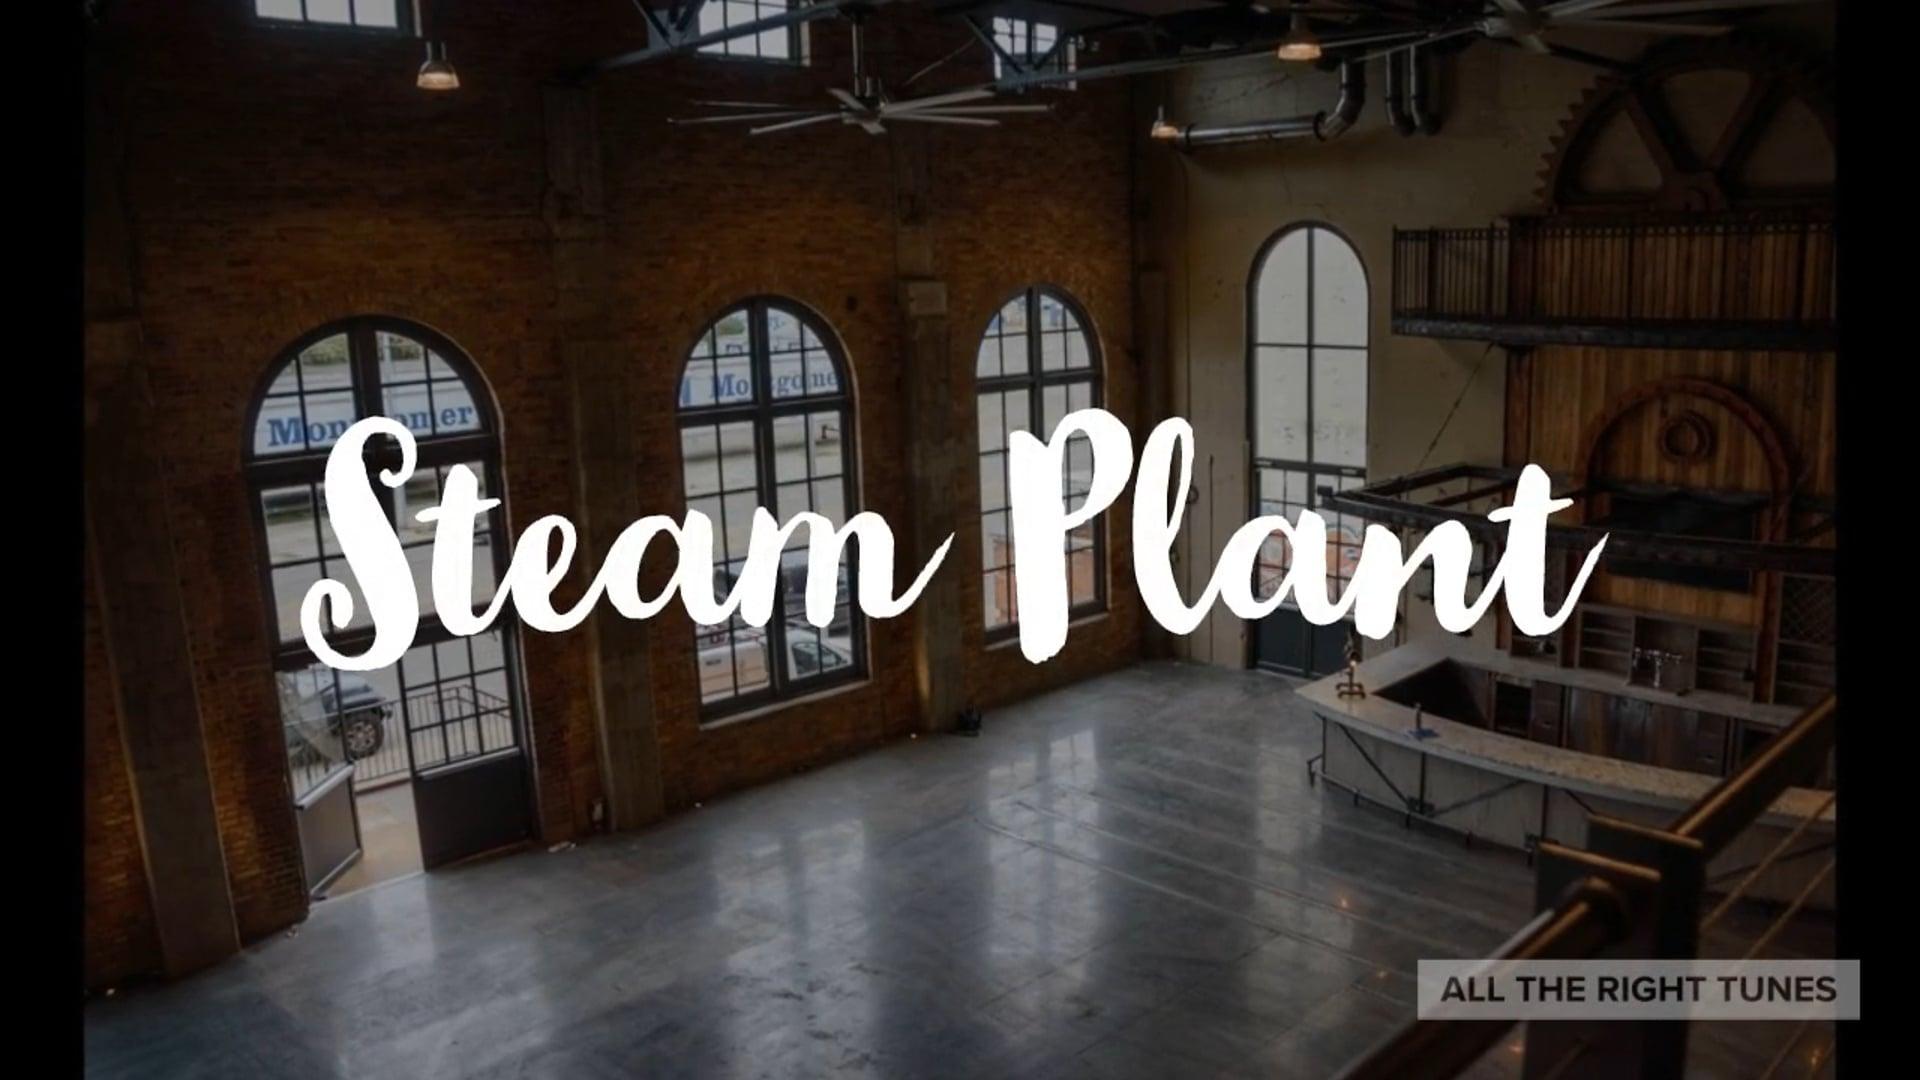 Quick Looks! Dayton Steam Plant